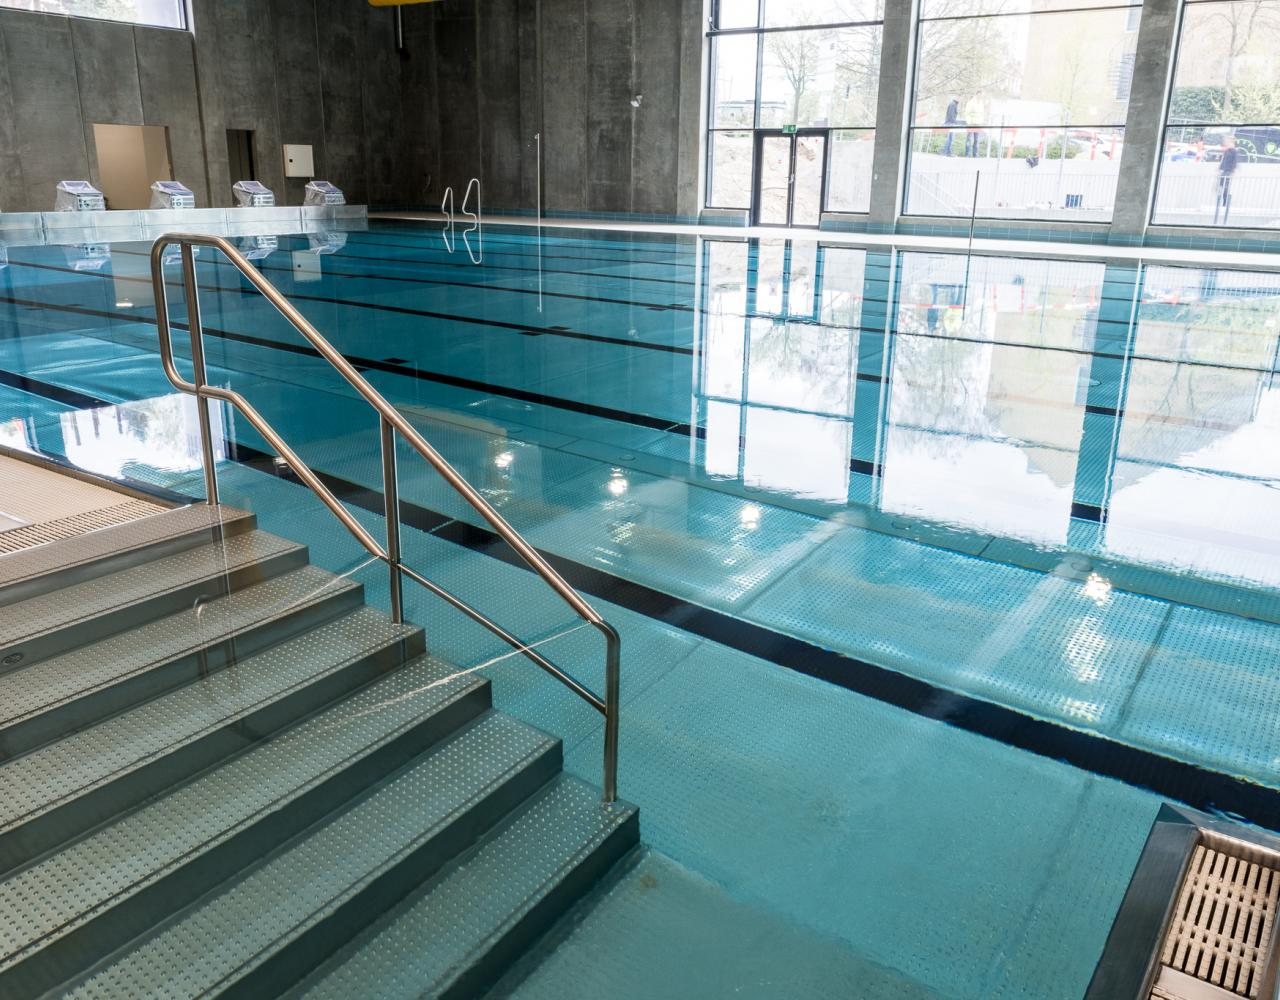 flintholm svømmehal basin